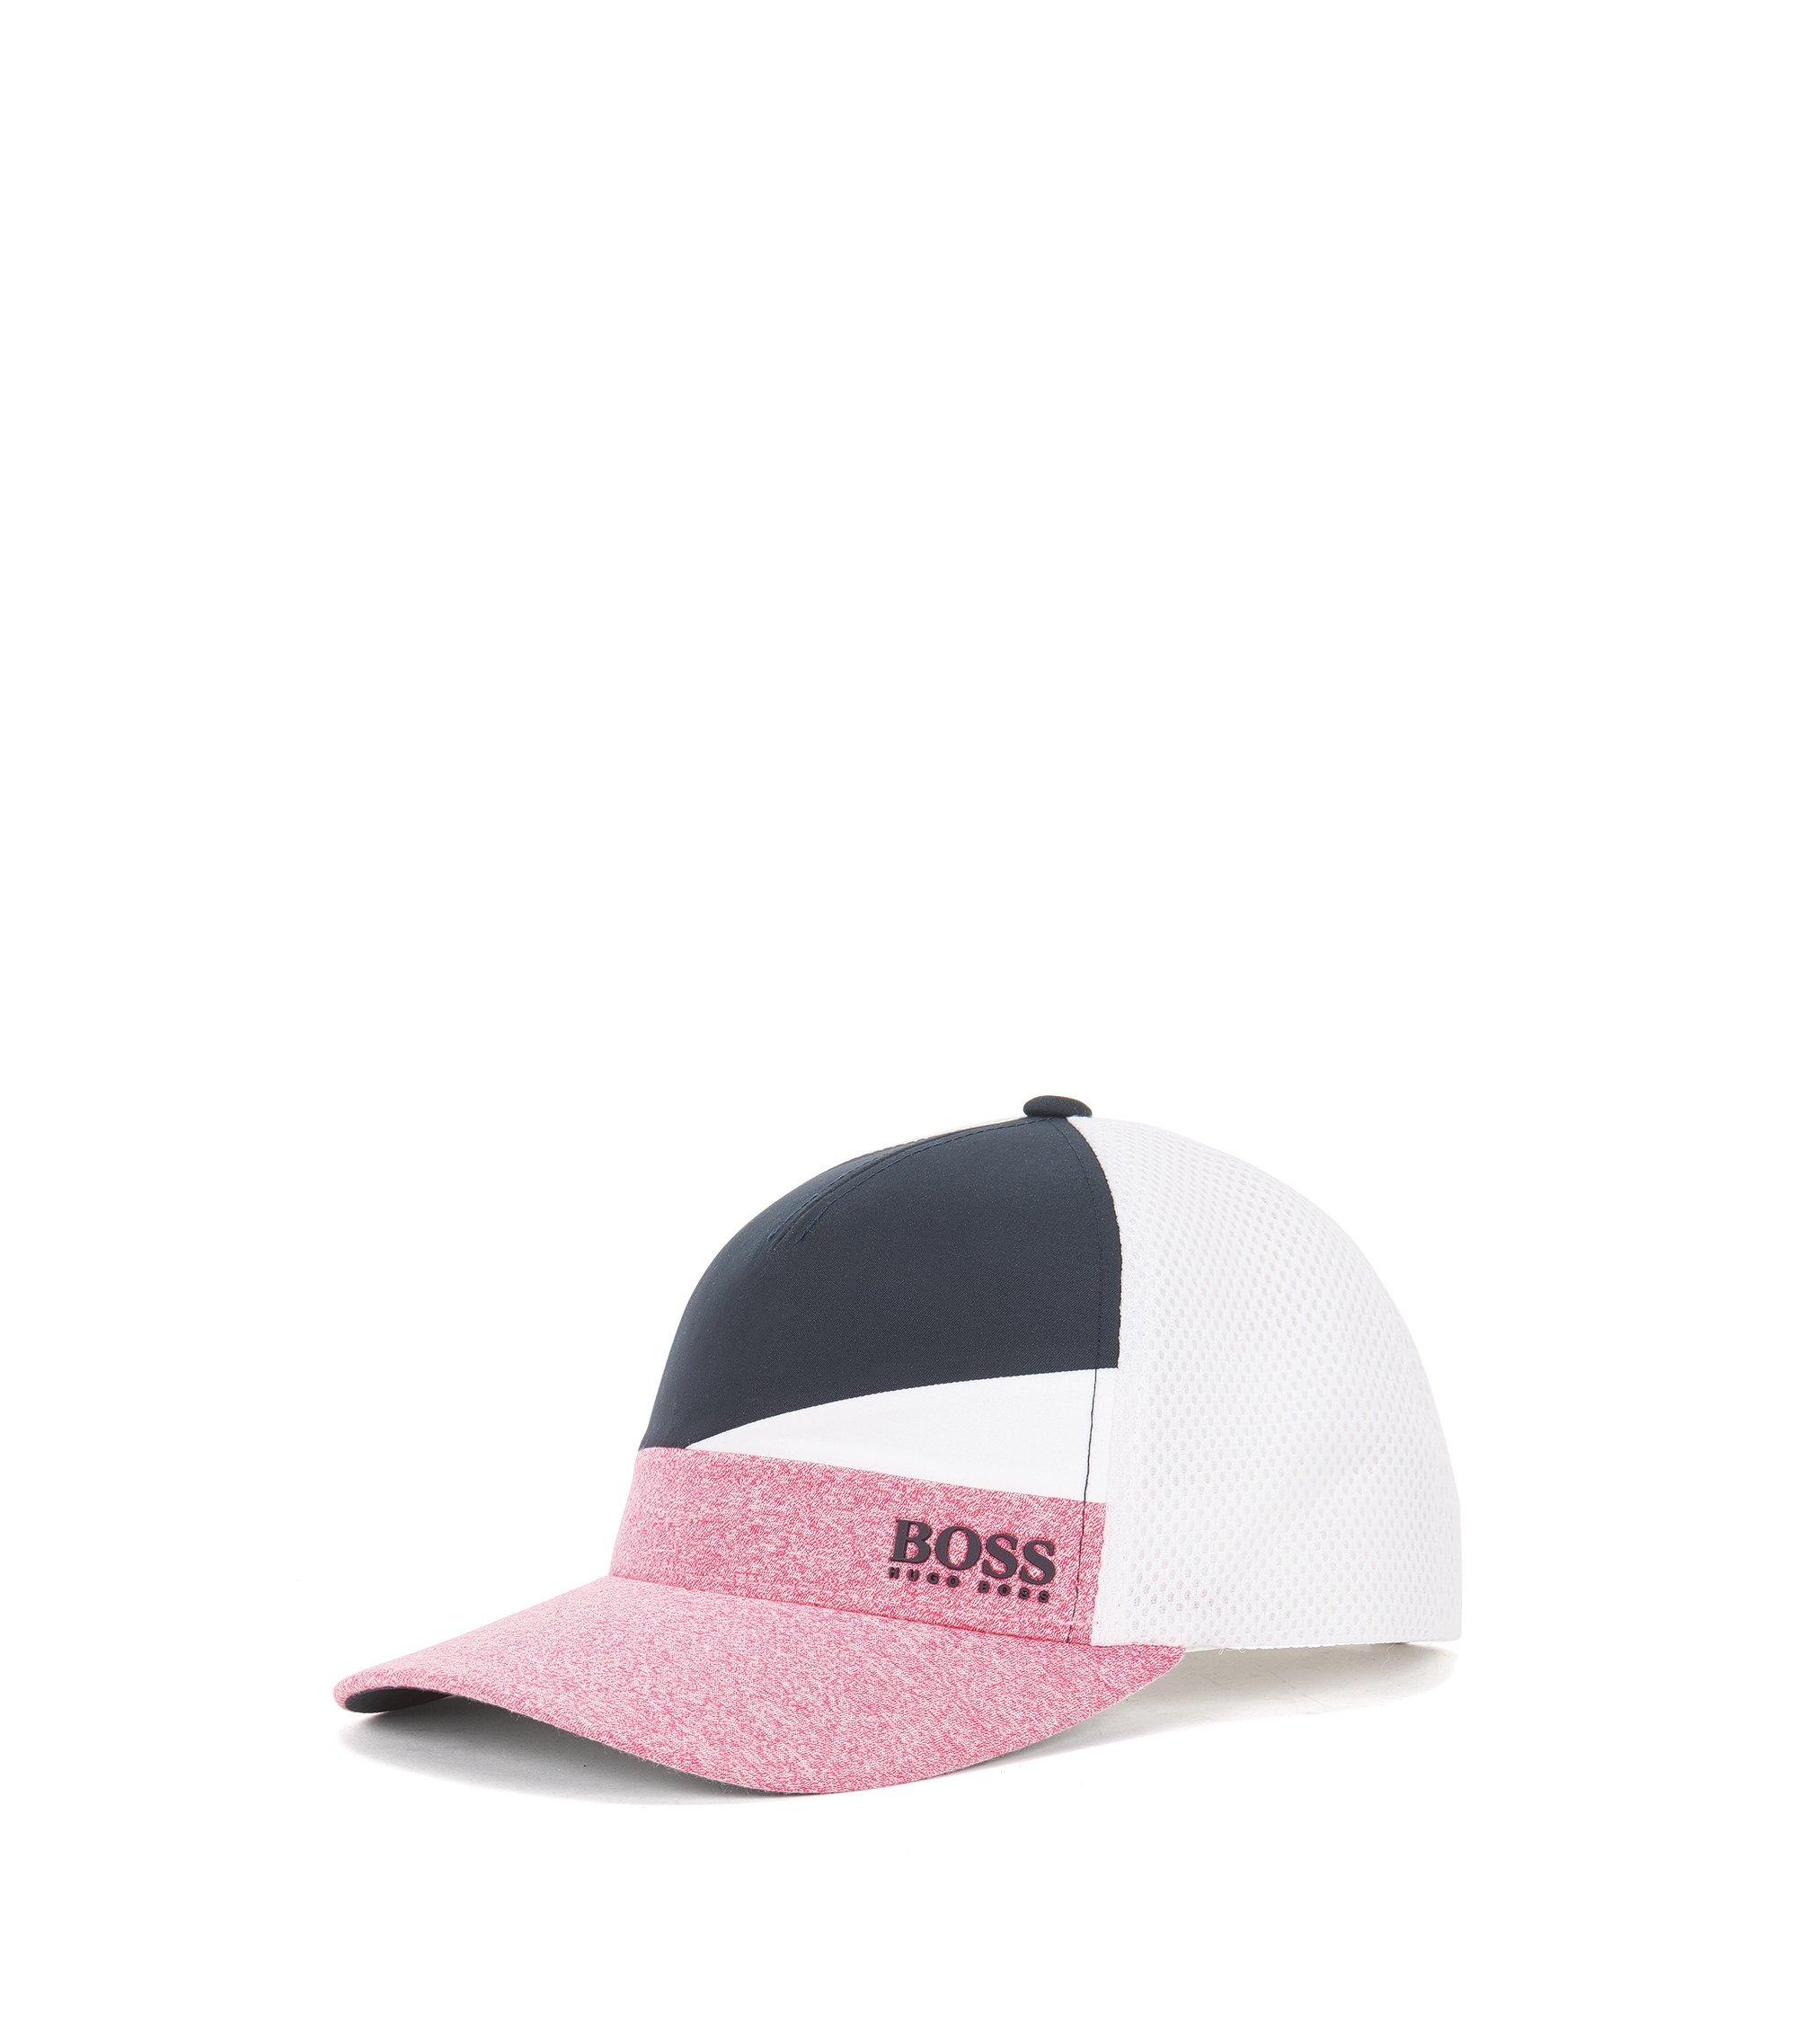 Woven Baseball Cap | Printcap, Pink